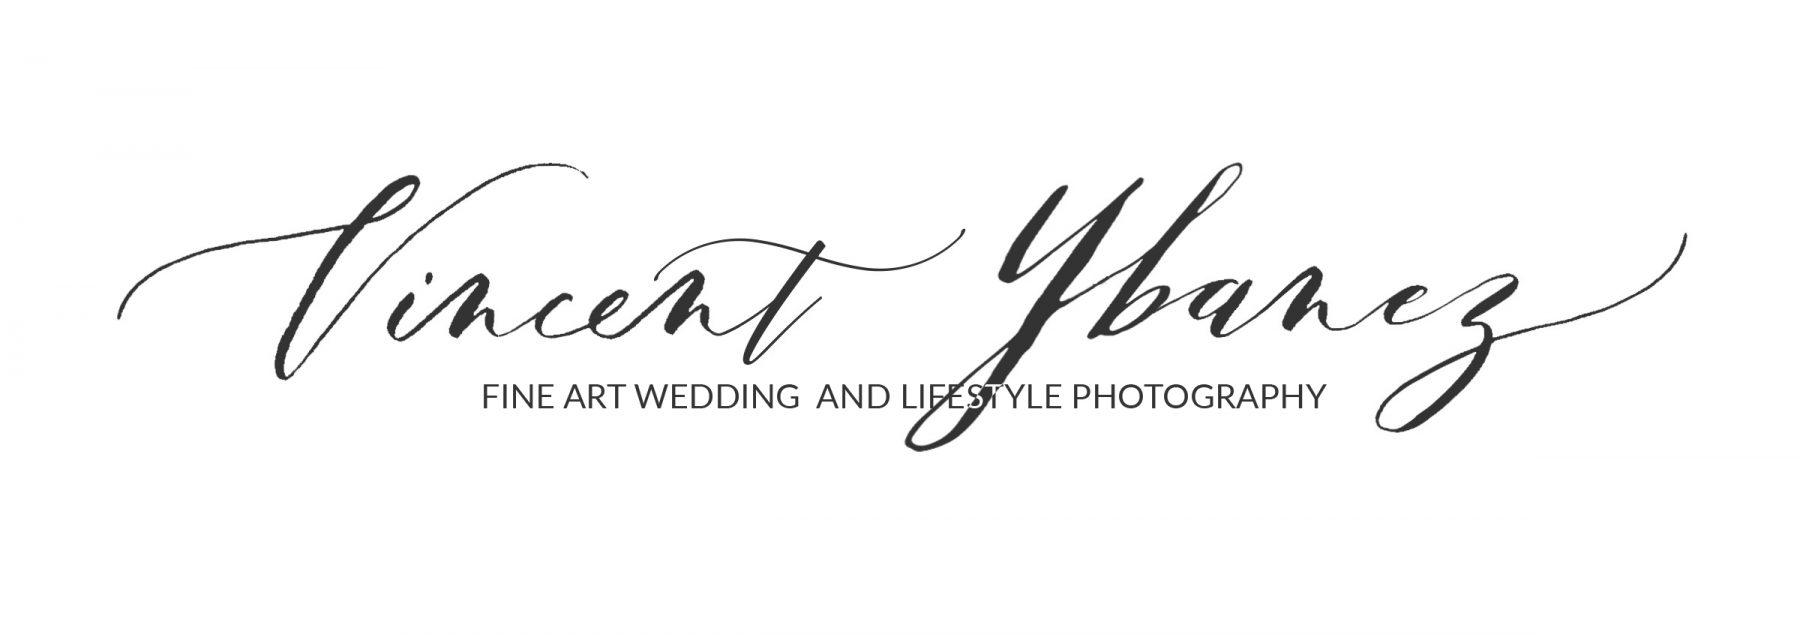 Vincent Ybanez Photography